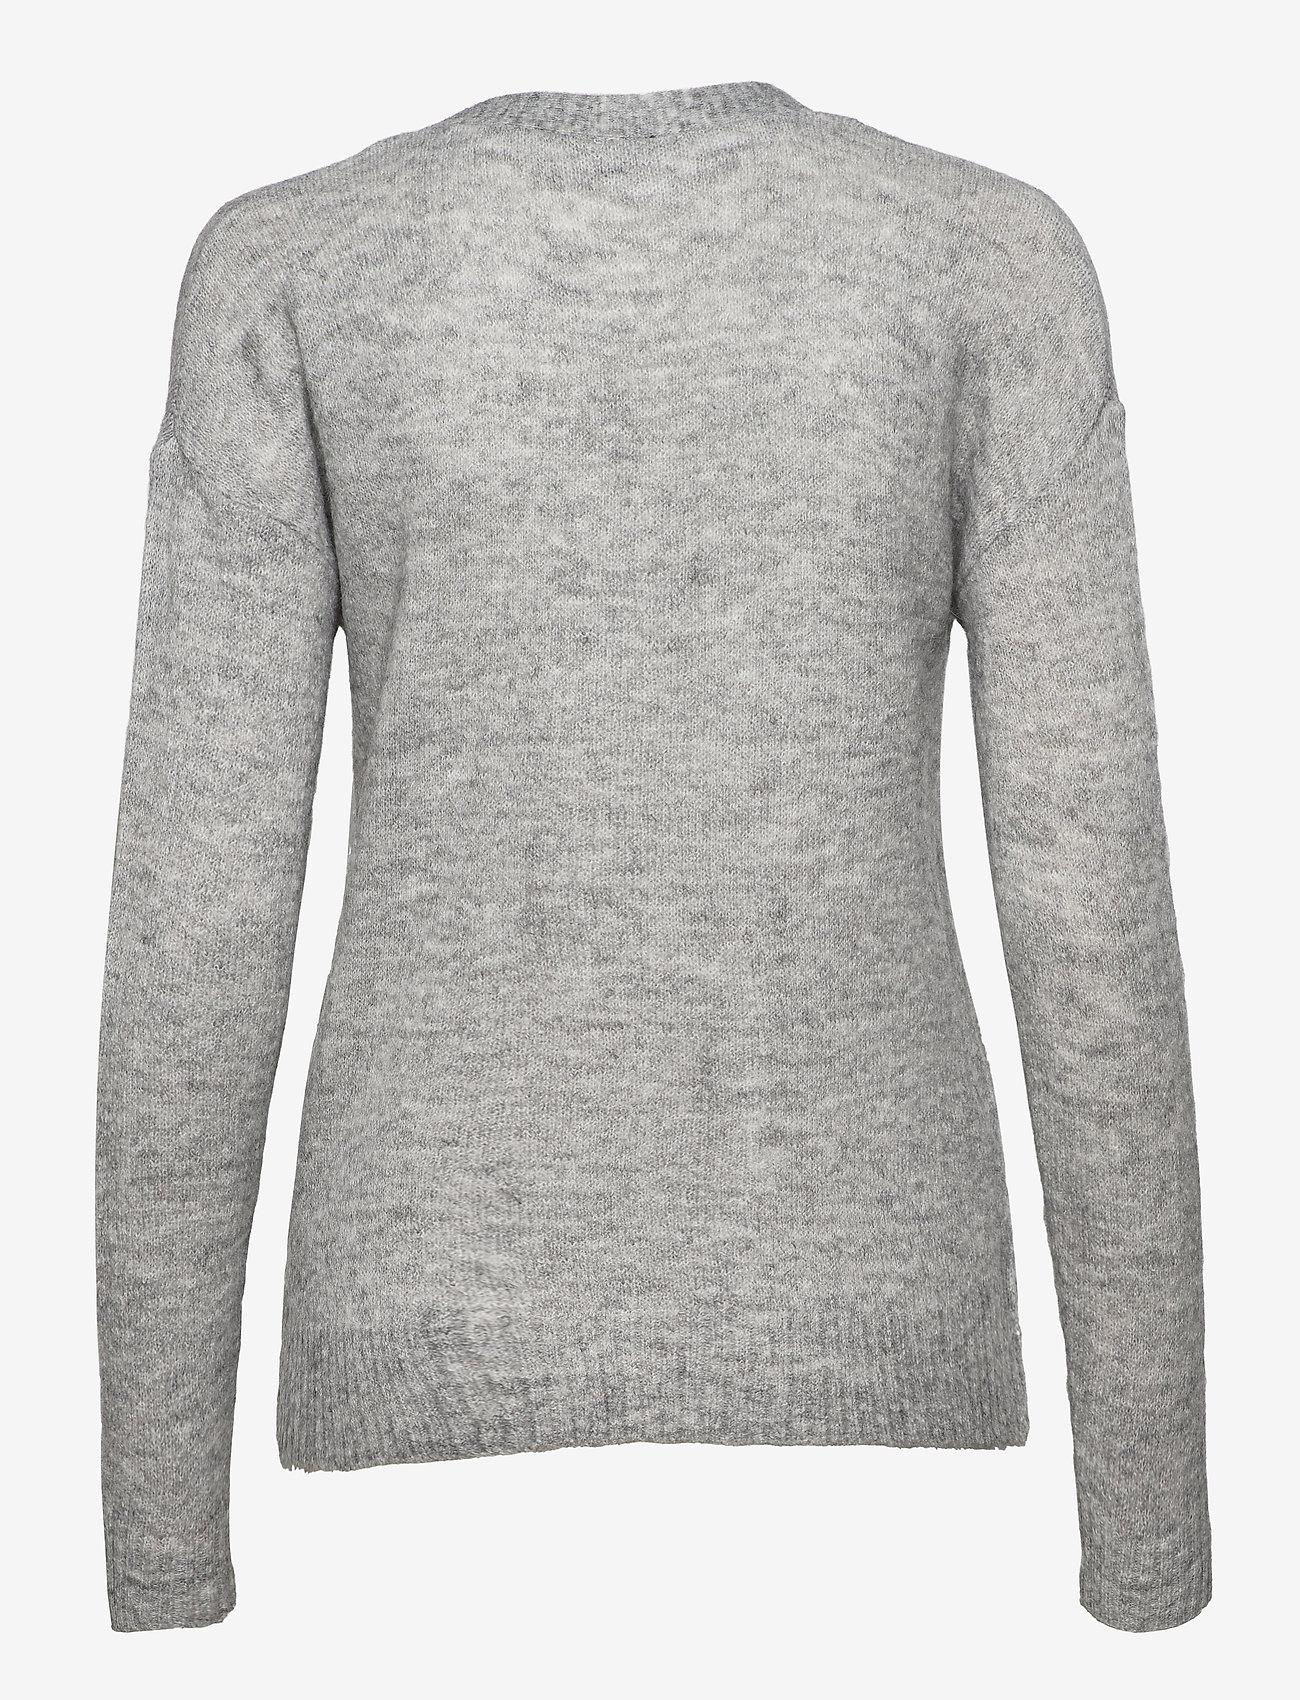 ICHI - AMARA CA2 - cardigans - grey melange - 1